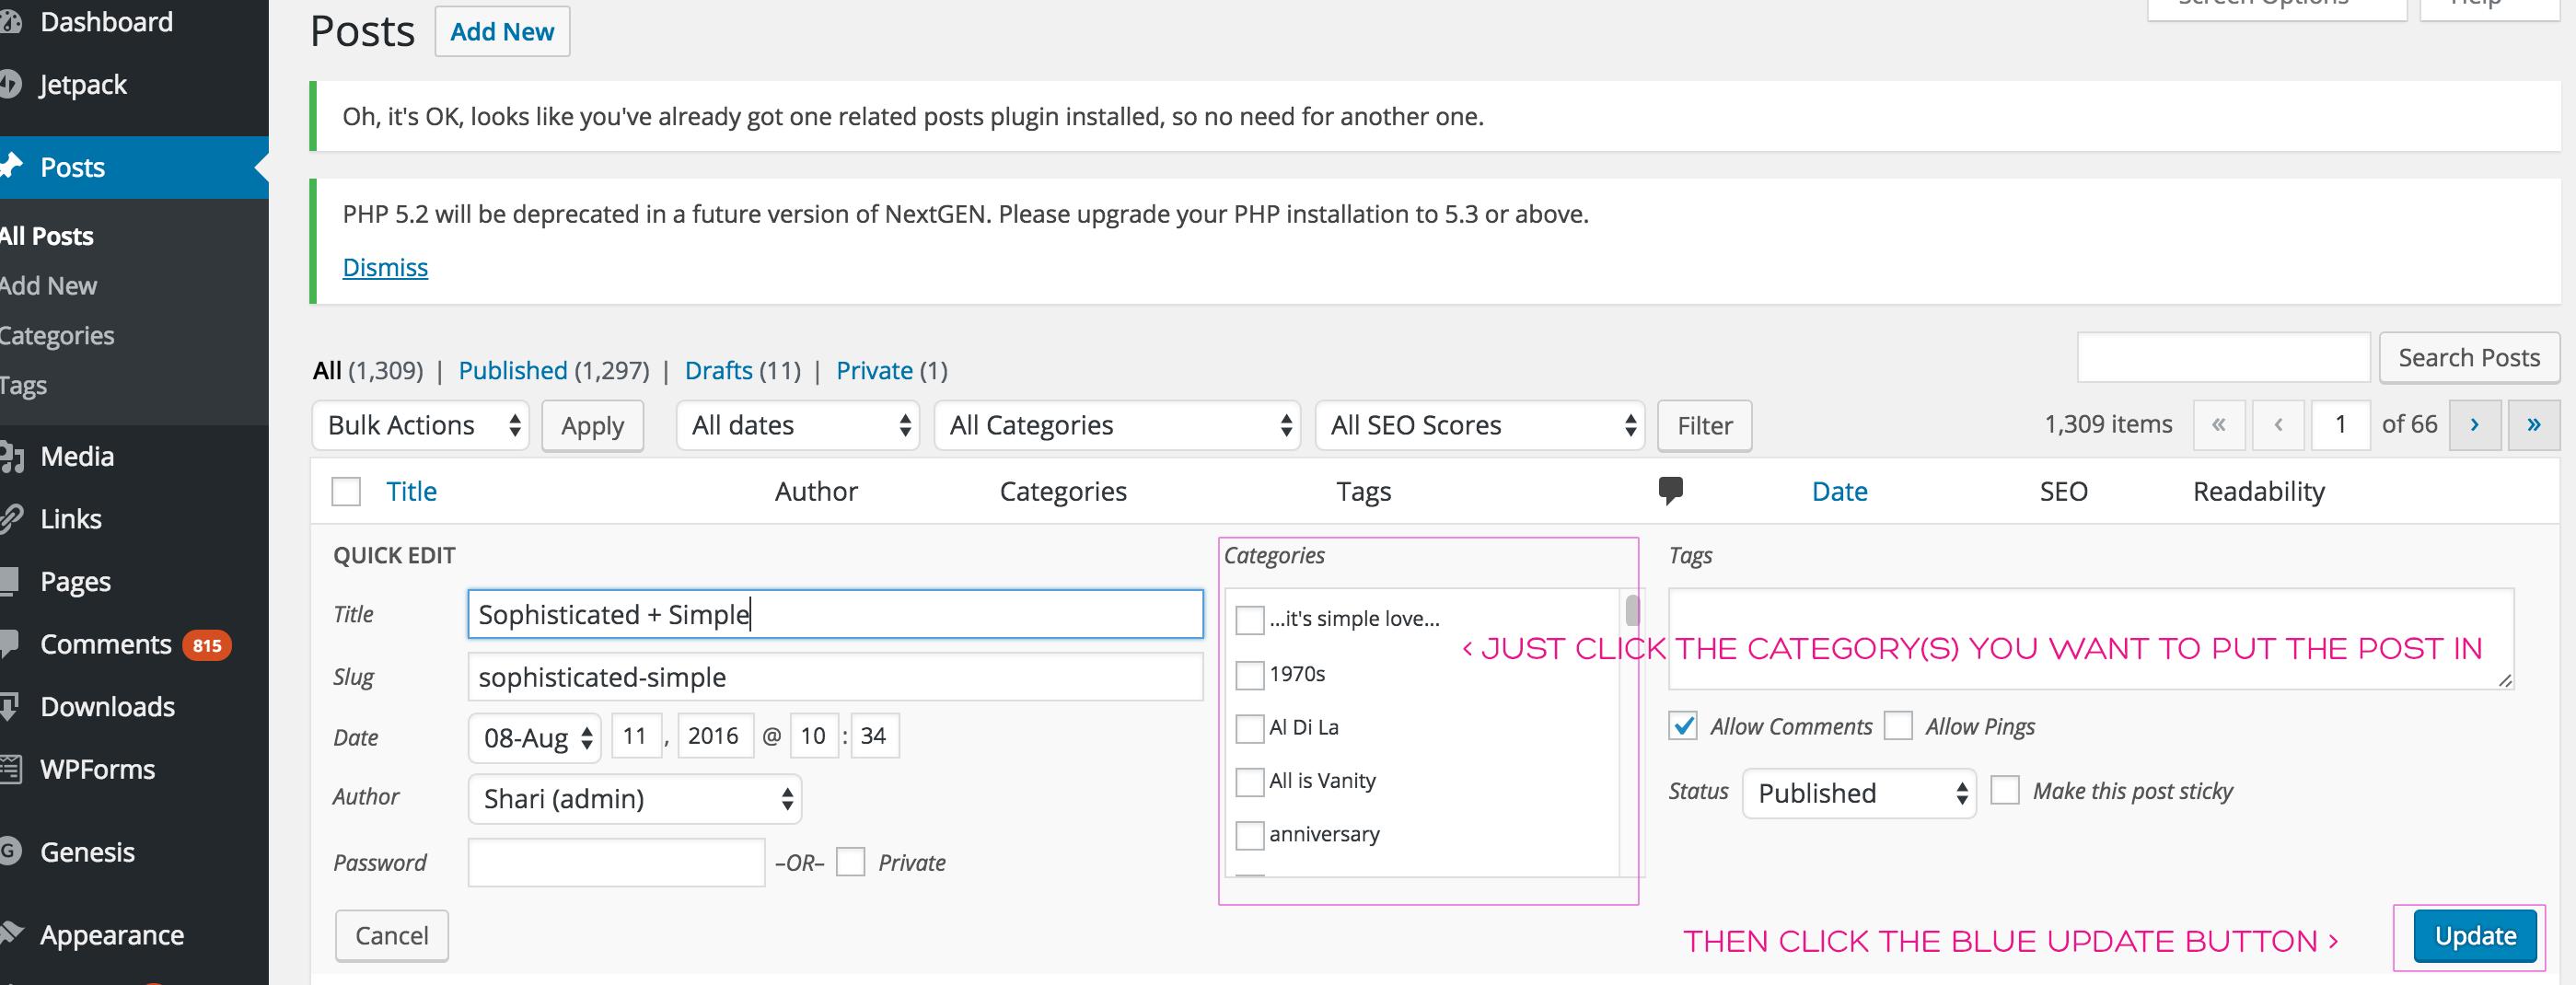 categorize posts screenshot 2